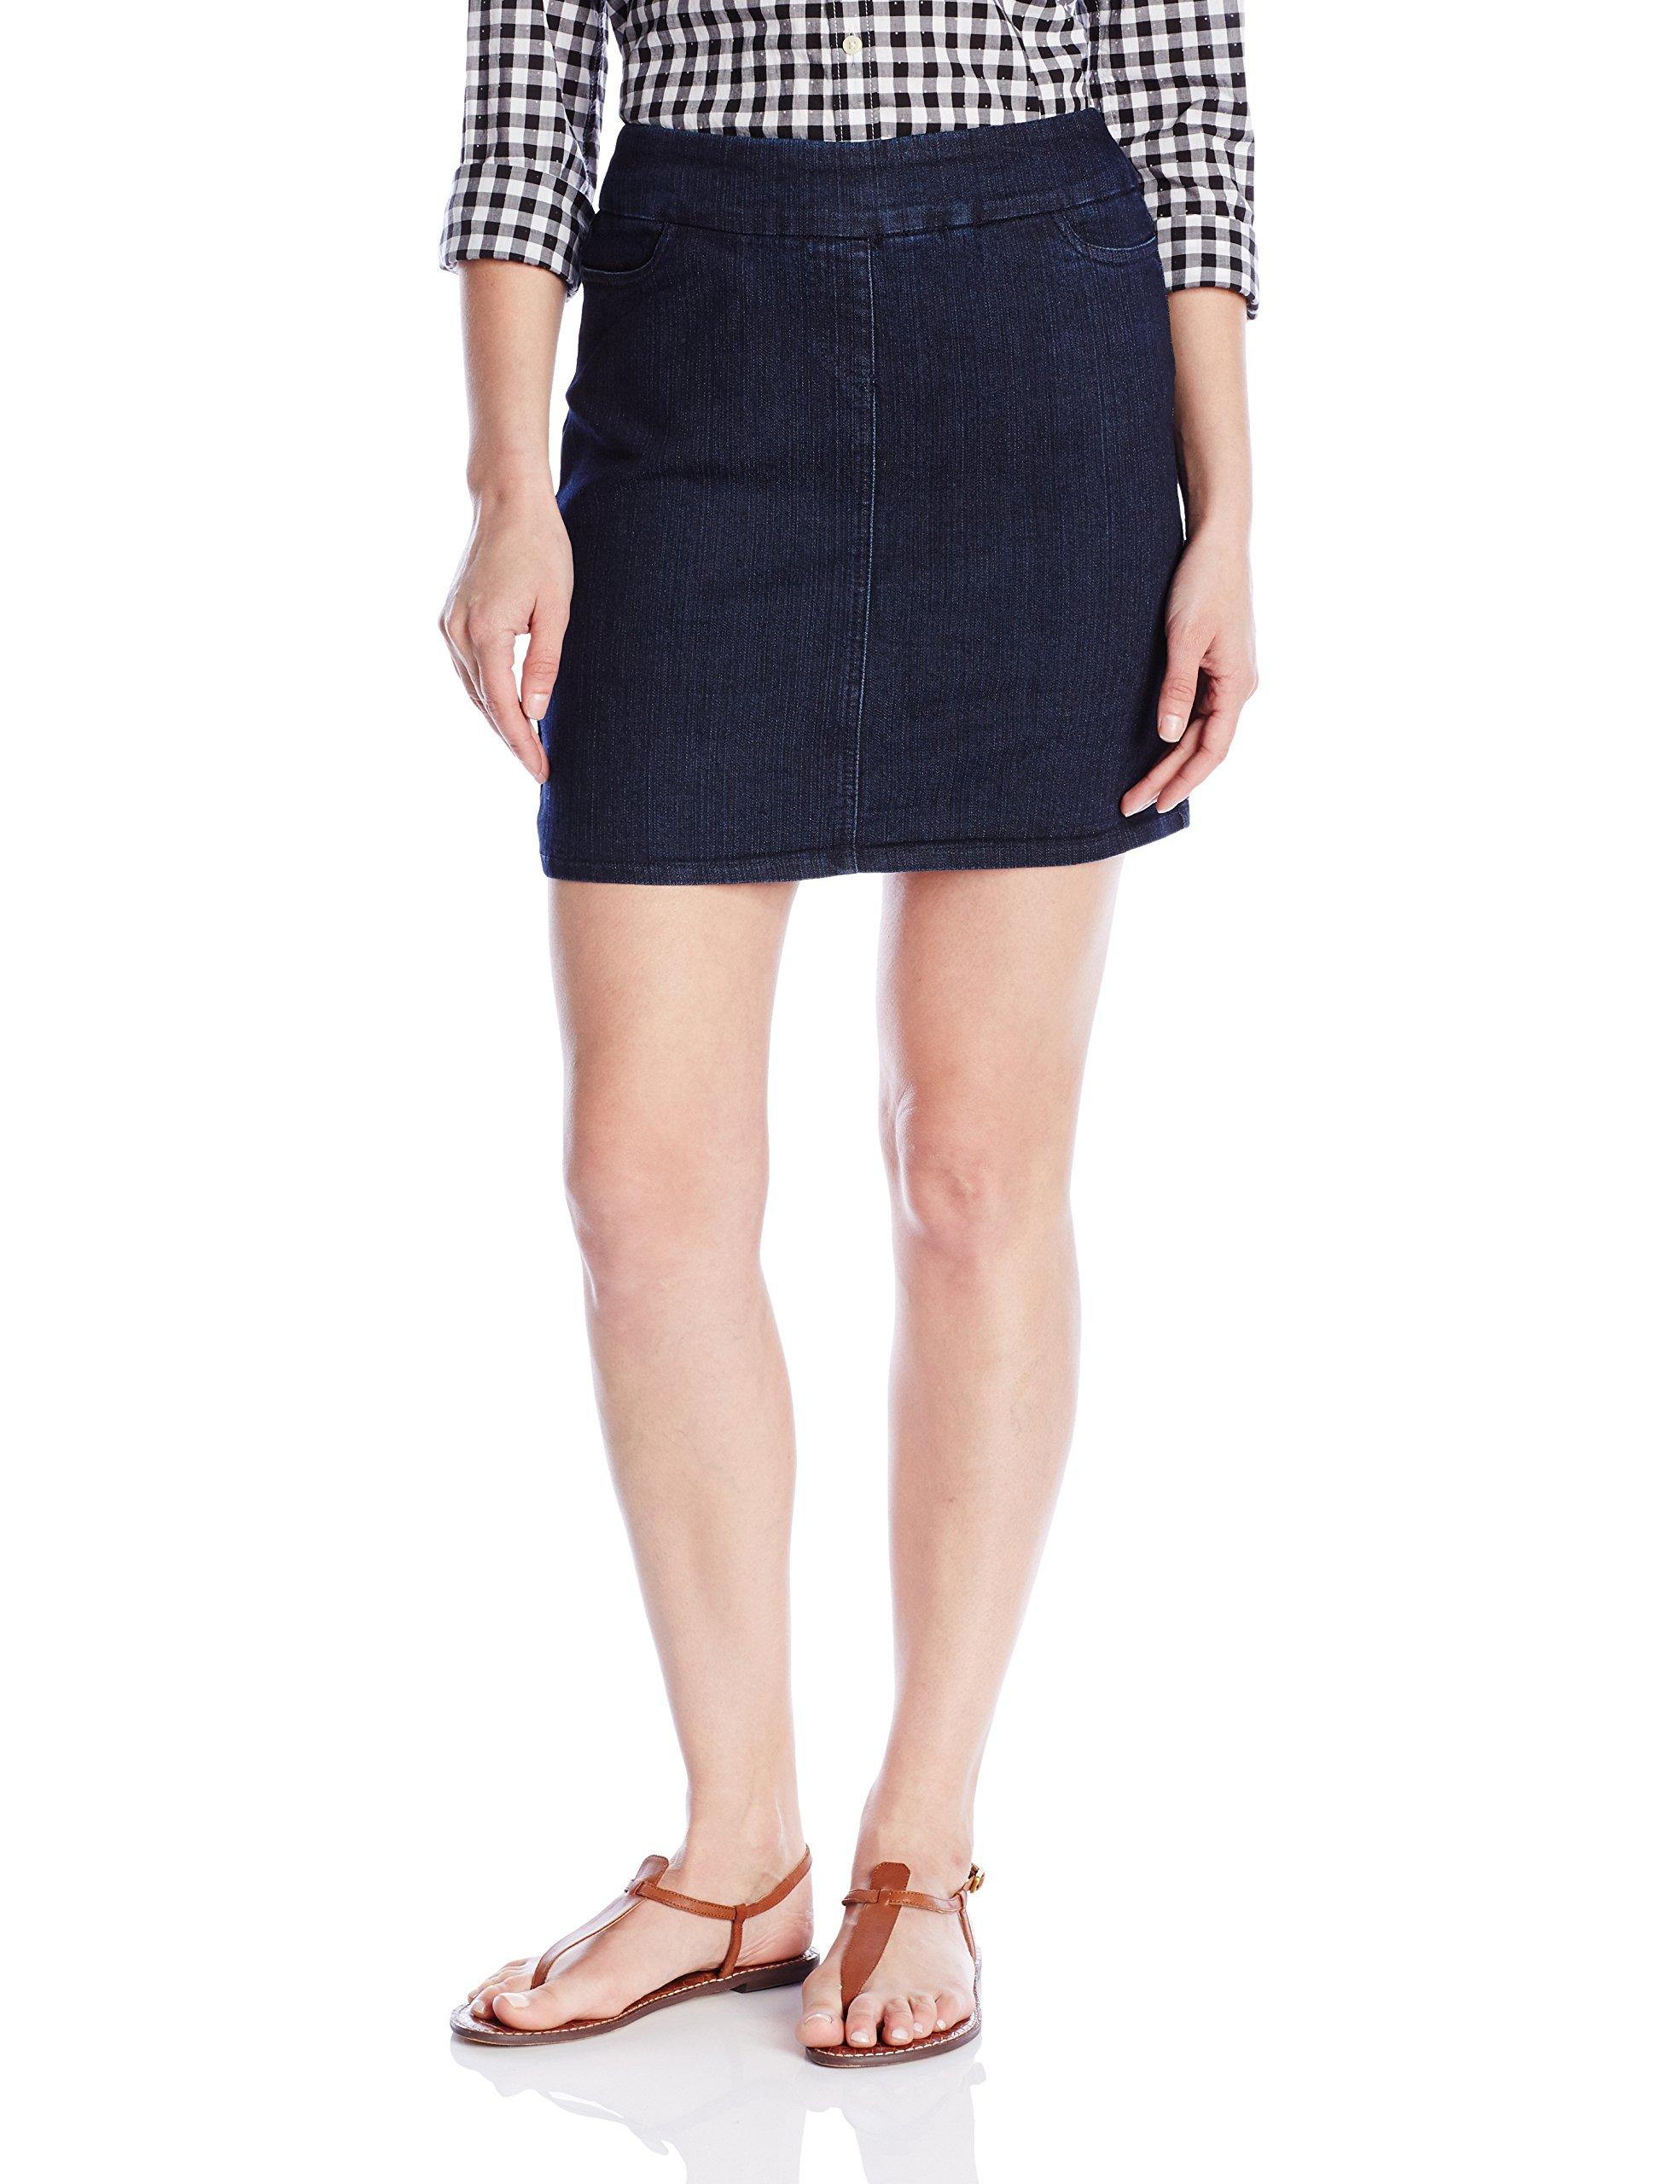 SLIM-SATION Women's Size Wide Band Solid Skort, Denim, 14